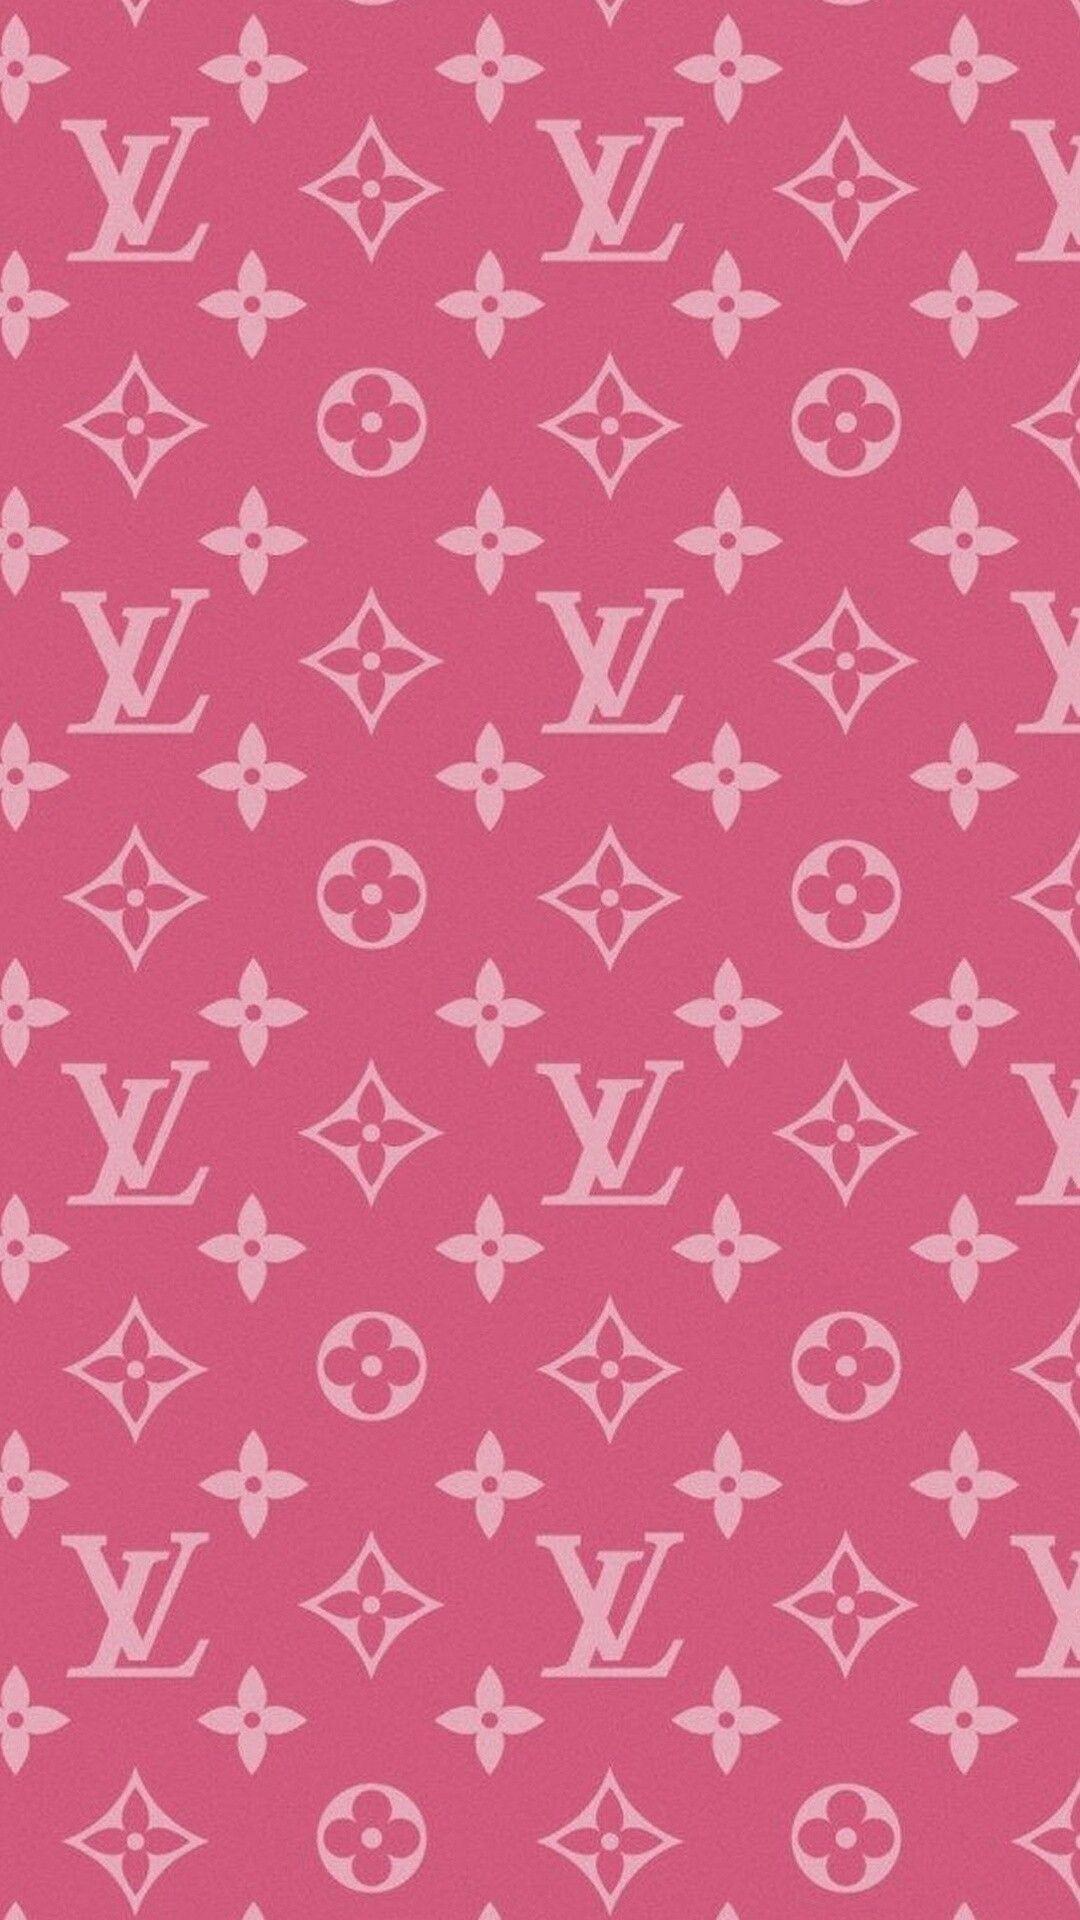 Louis Vuitton Pink Wallpapers - Top